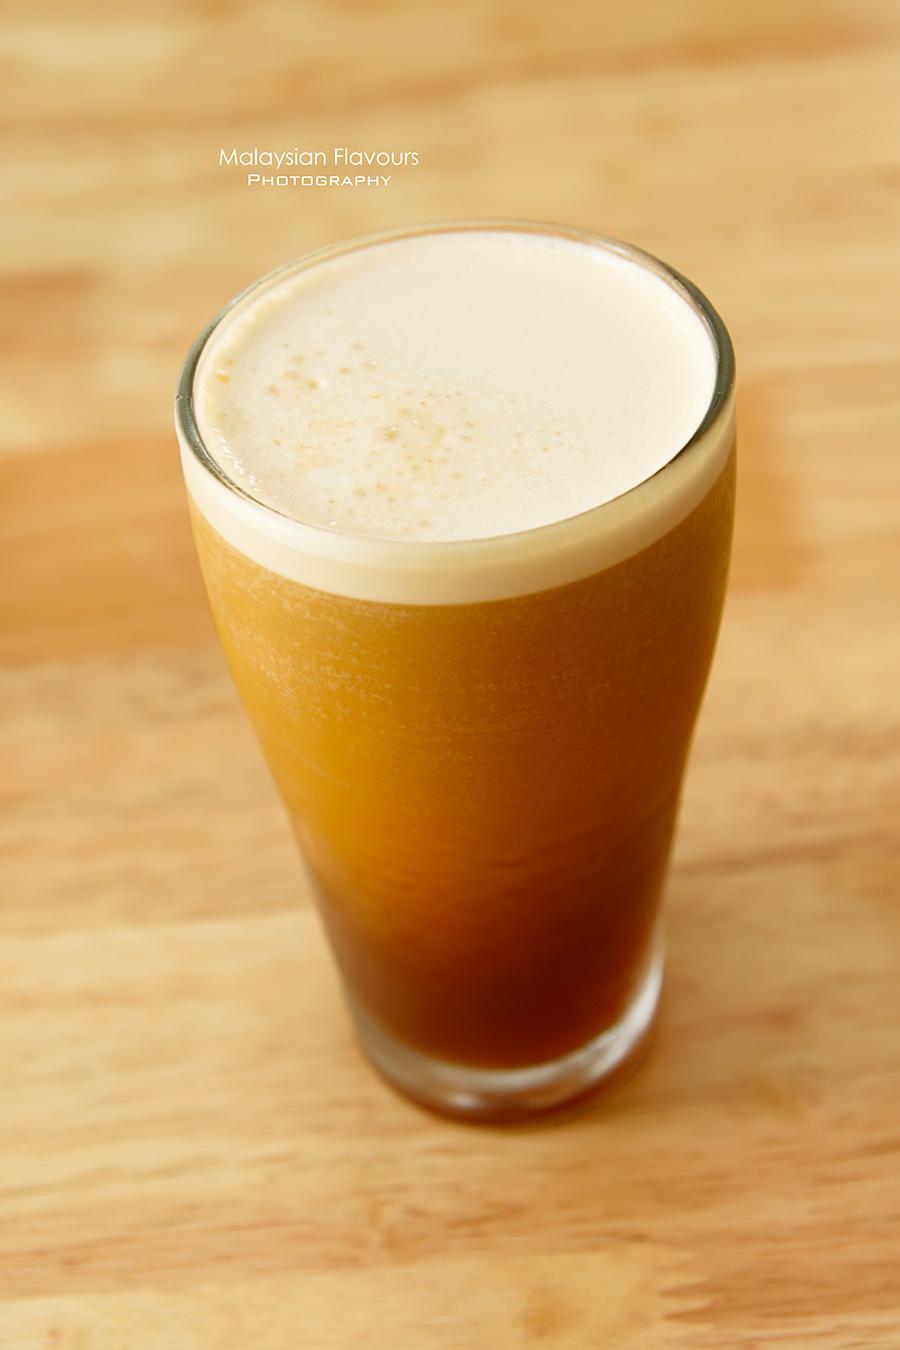 bean-reserve-bangsar-kl-softserve-coffee-nitrogen-tea